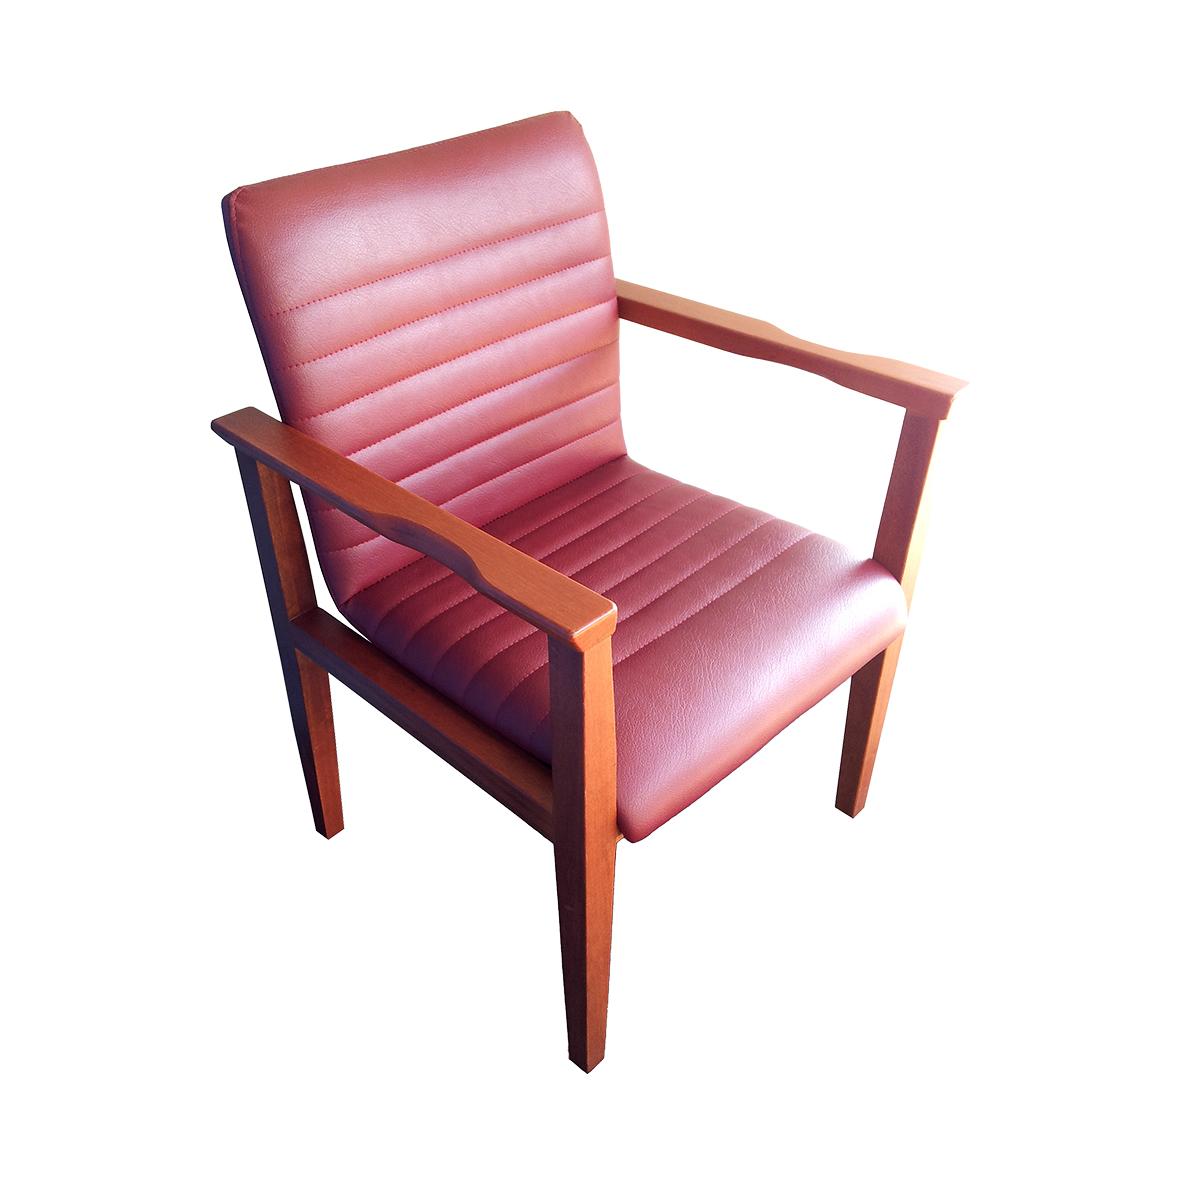 UPlan quadro chair.jpg